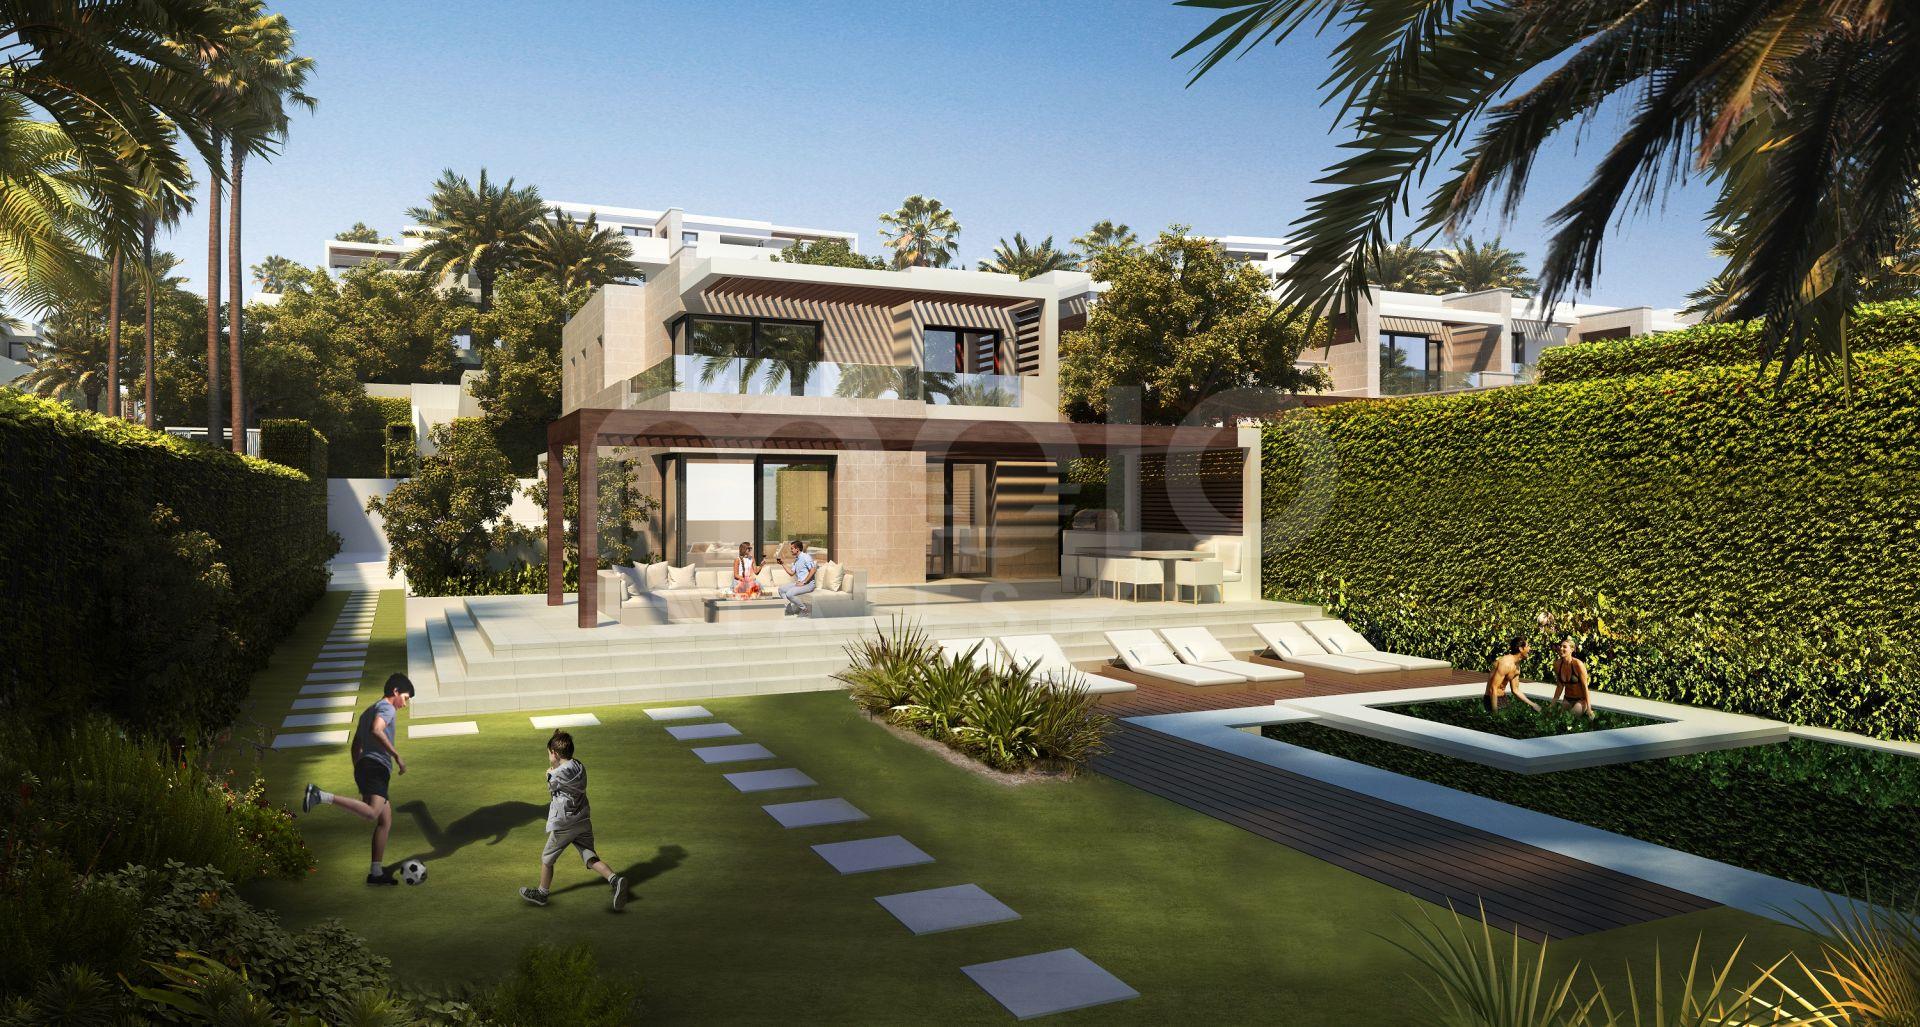 New beachfront development in Estepona